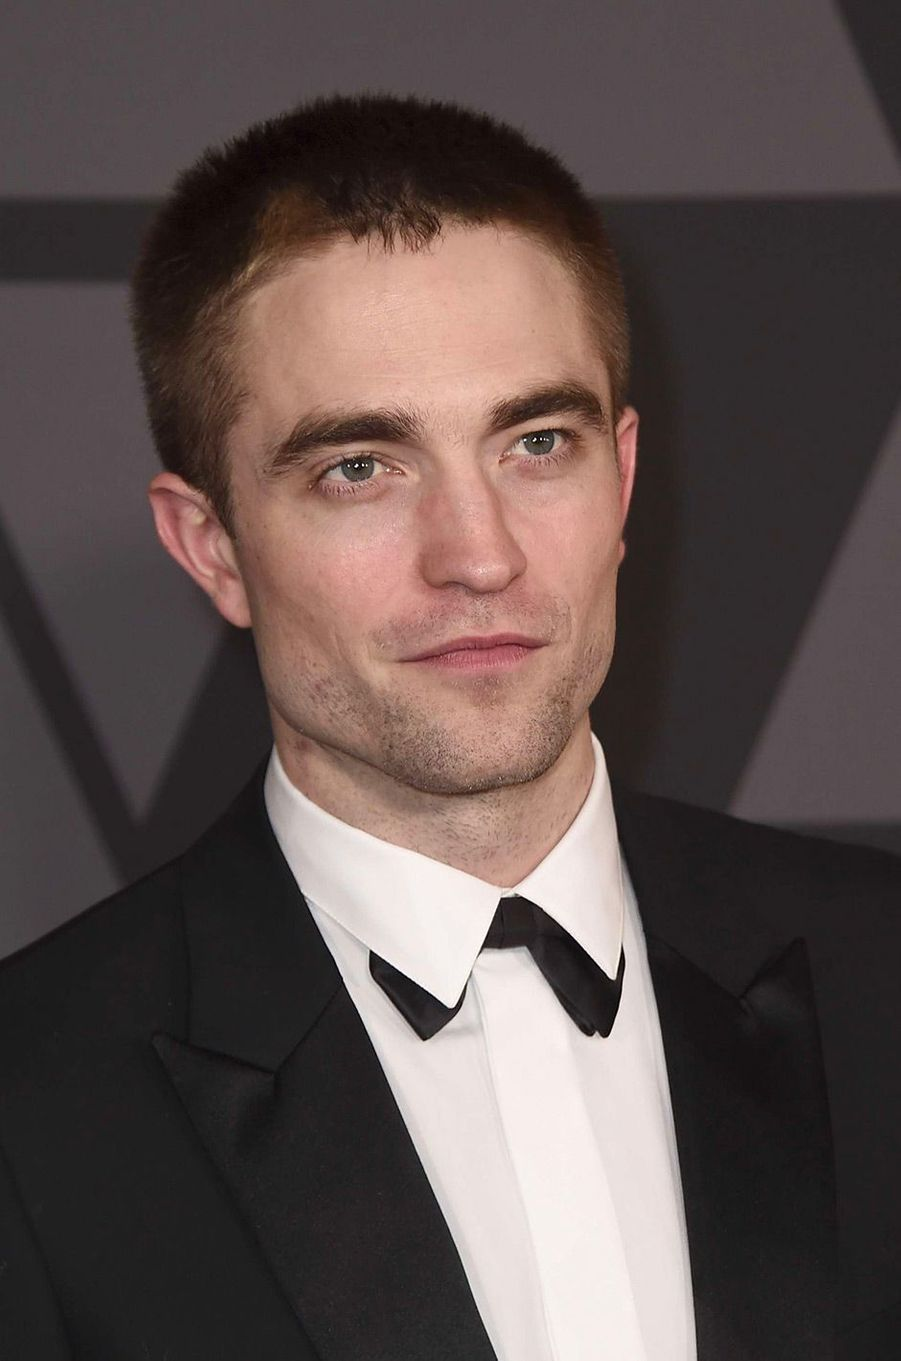 Robert Pattinson aux Governors Awards à Los Angeles, samedi 11 novembre